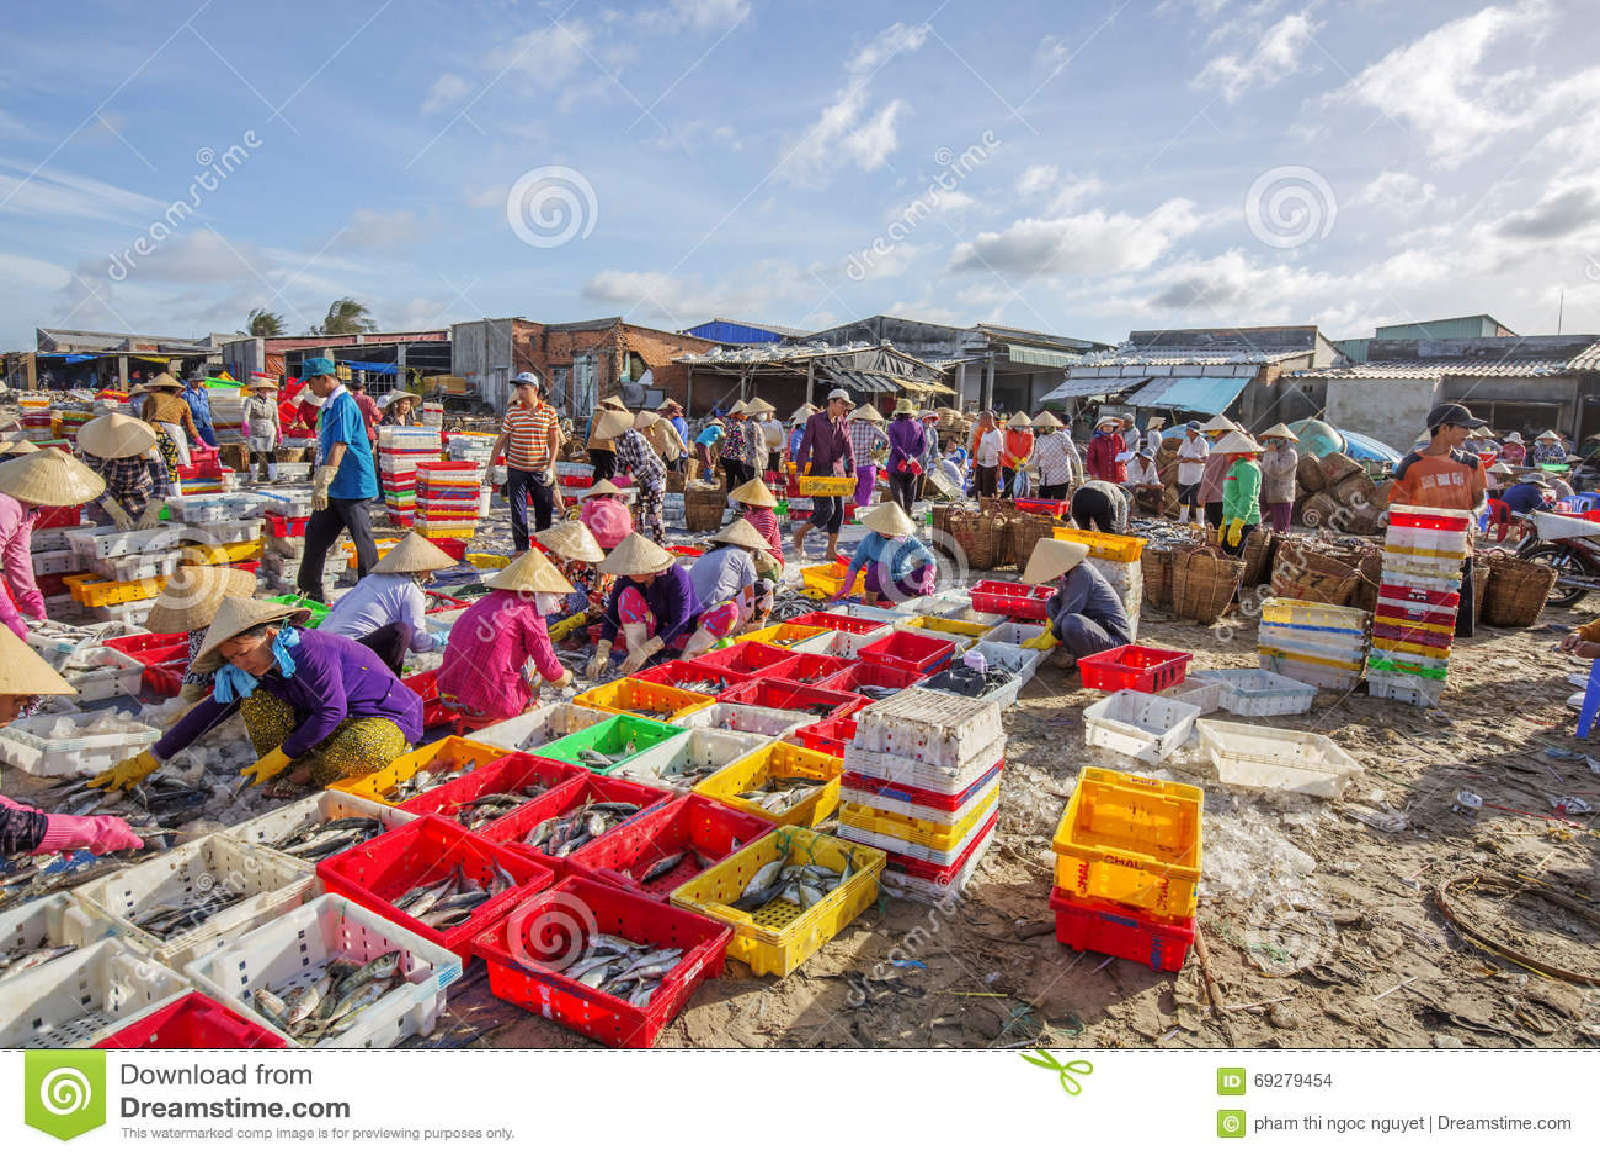 Long hai fish market editorial stock image image 69279454 for Closest fish market